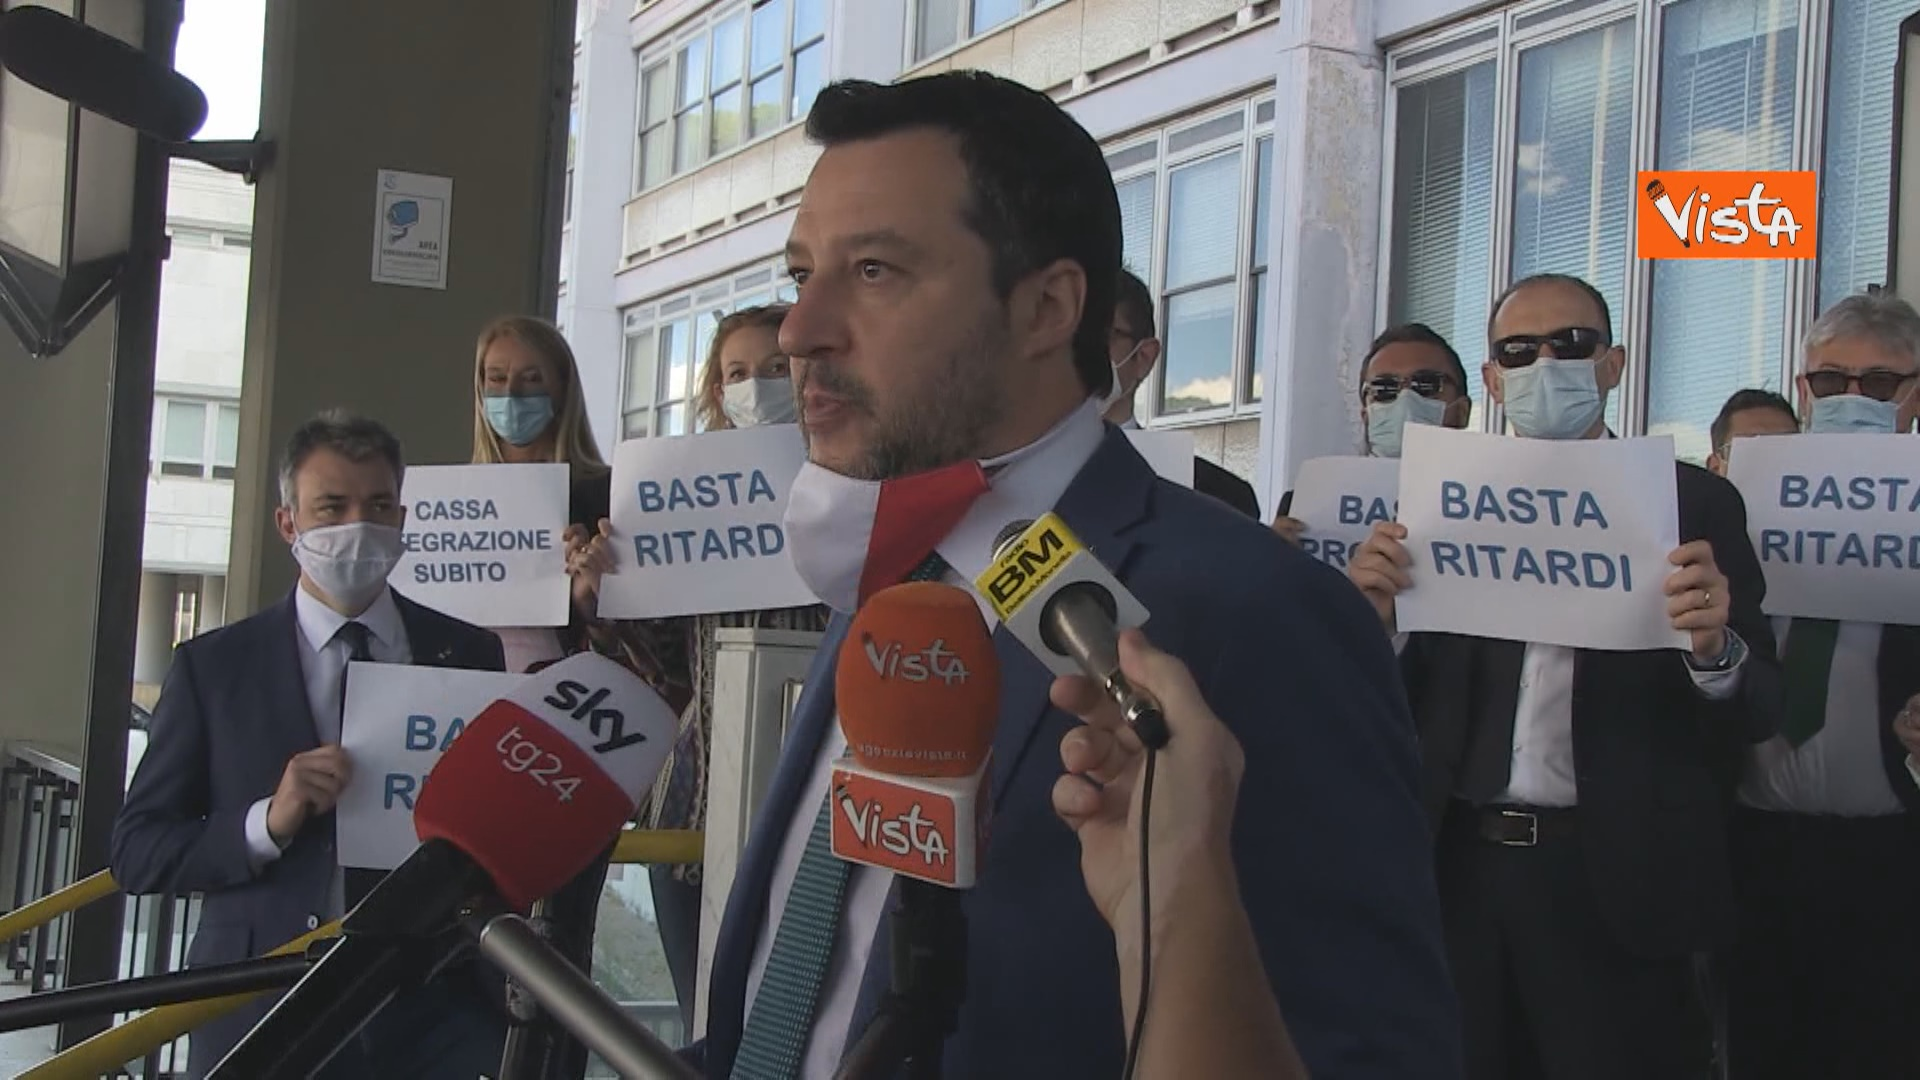 Salvini open arms